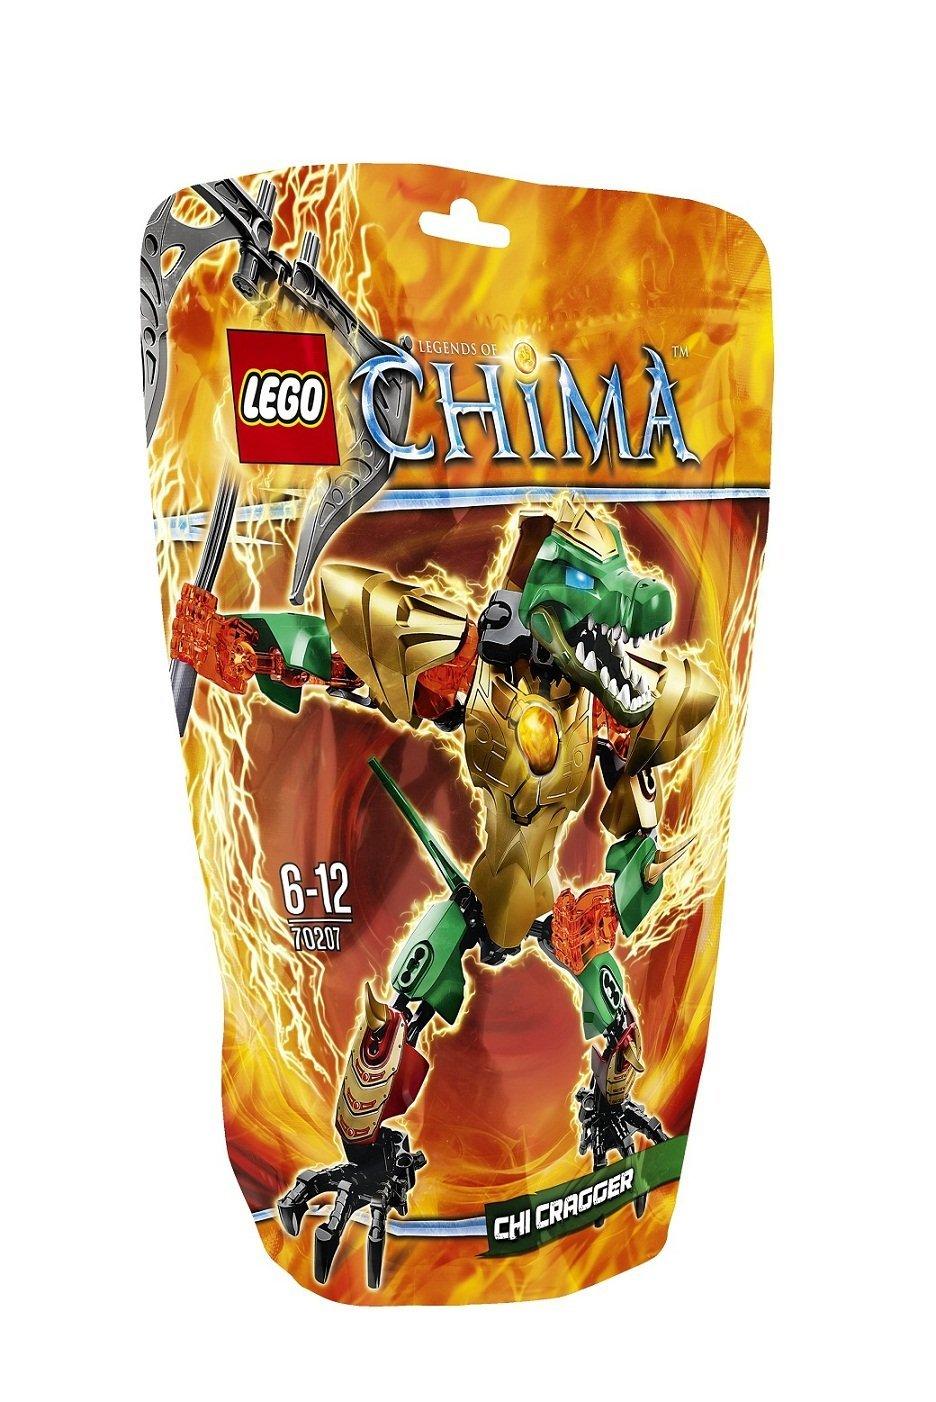 70207-Lego Chima CHI Cragger de LEGO